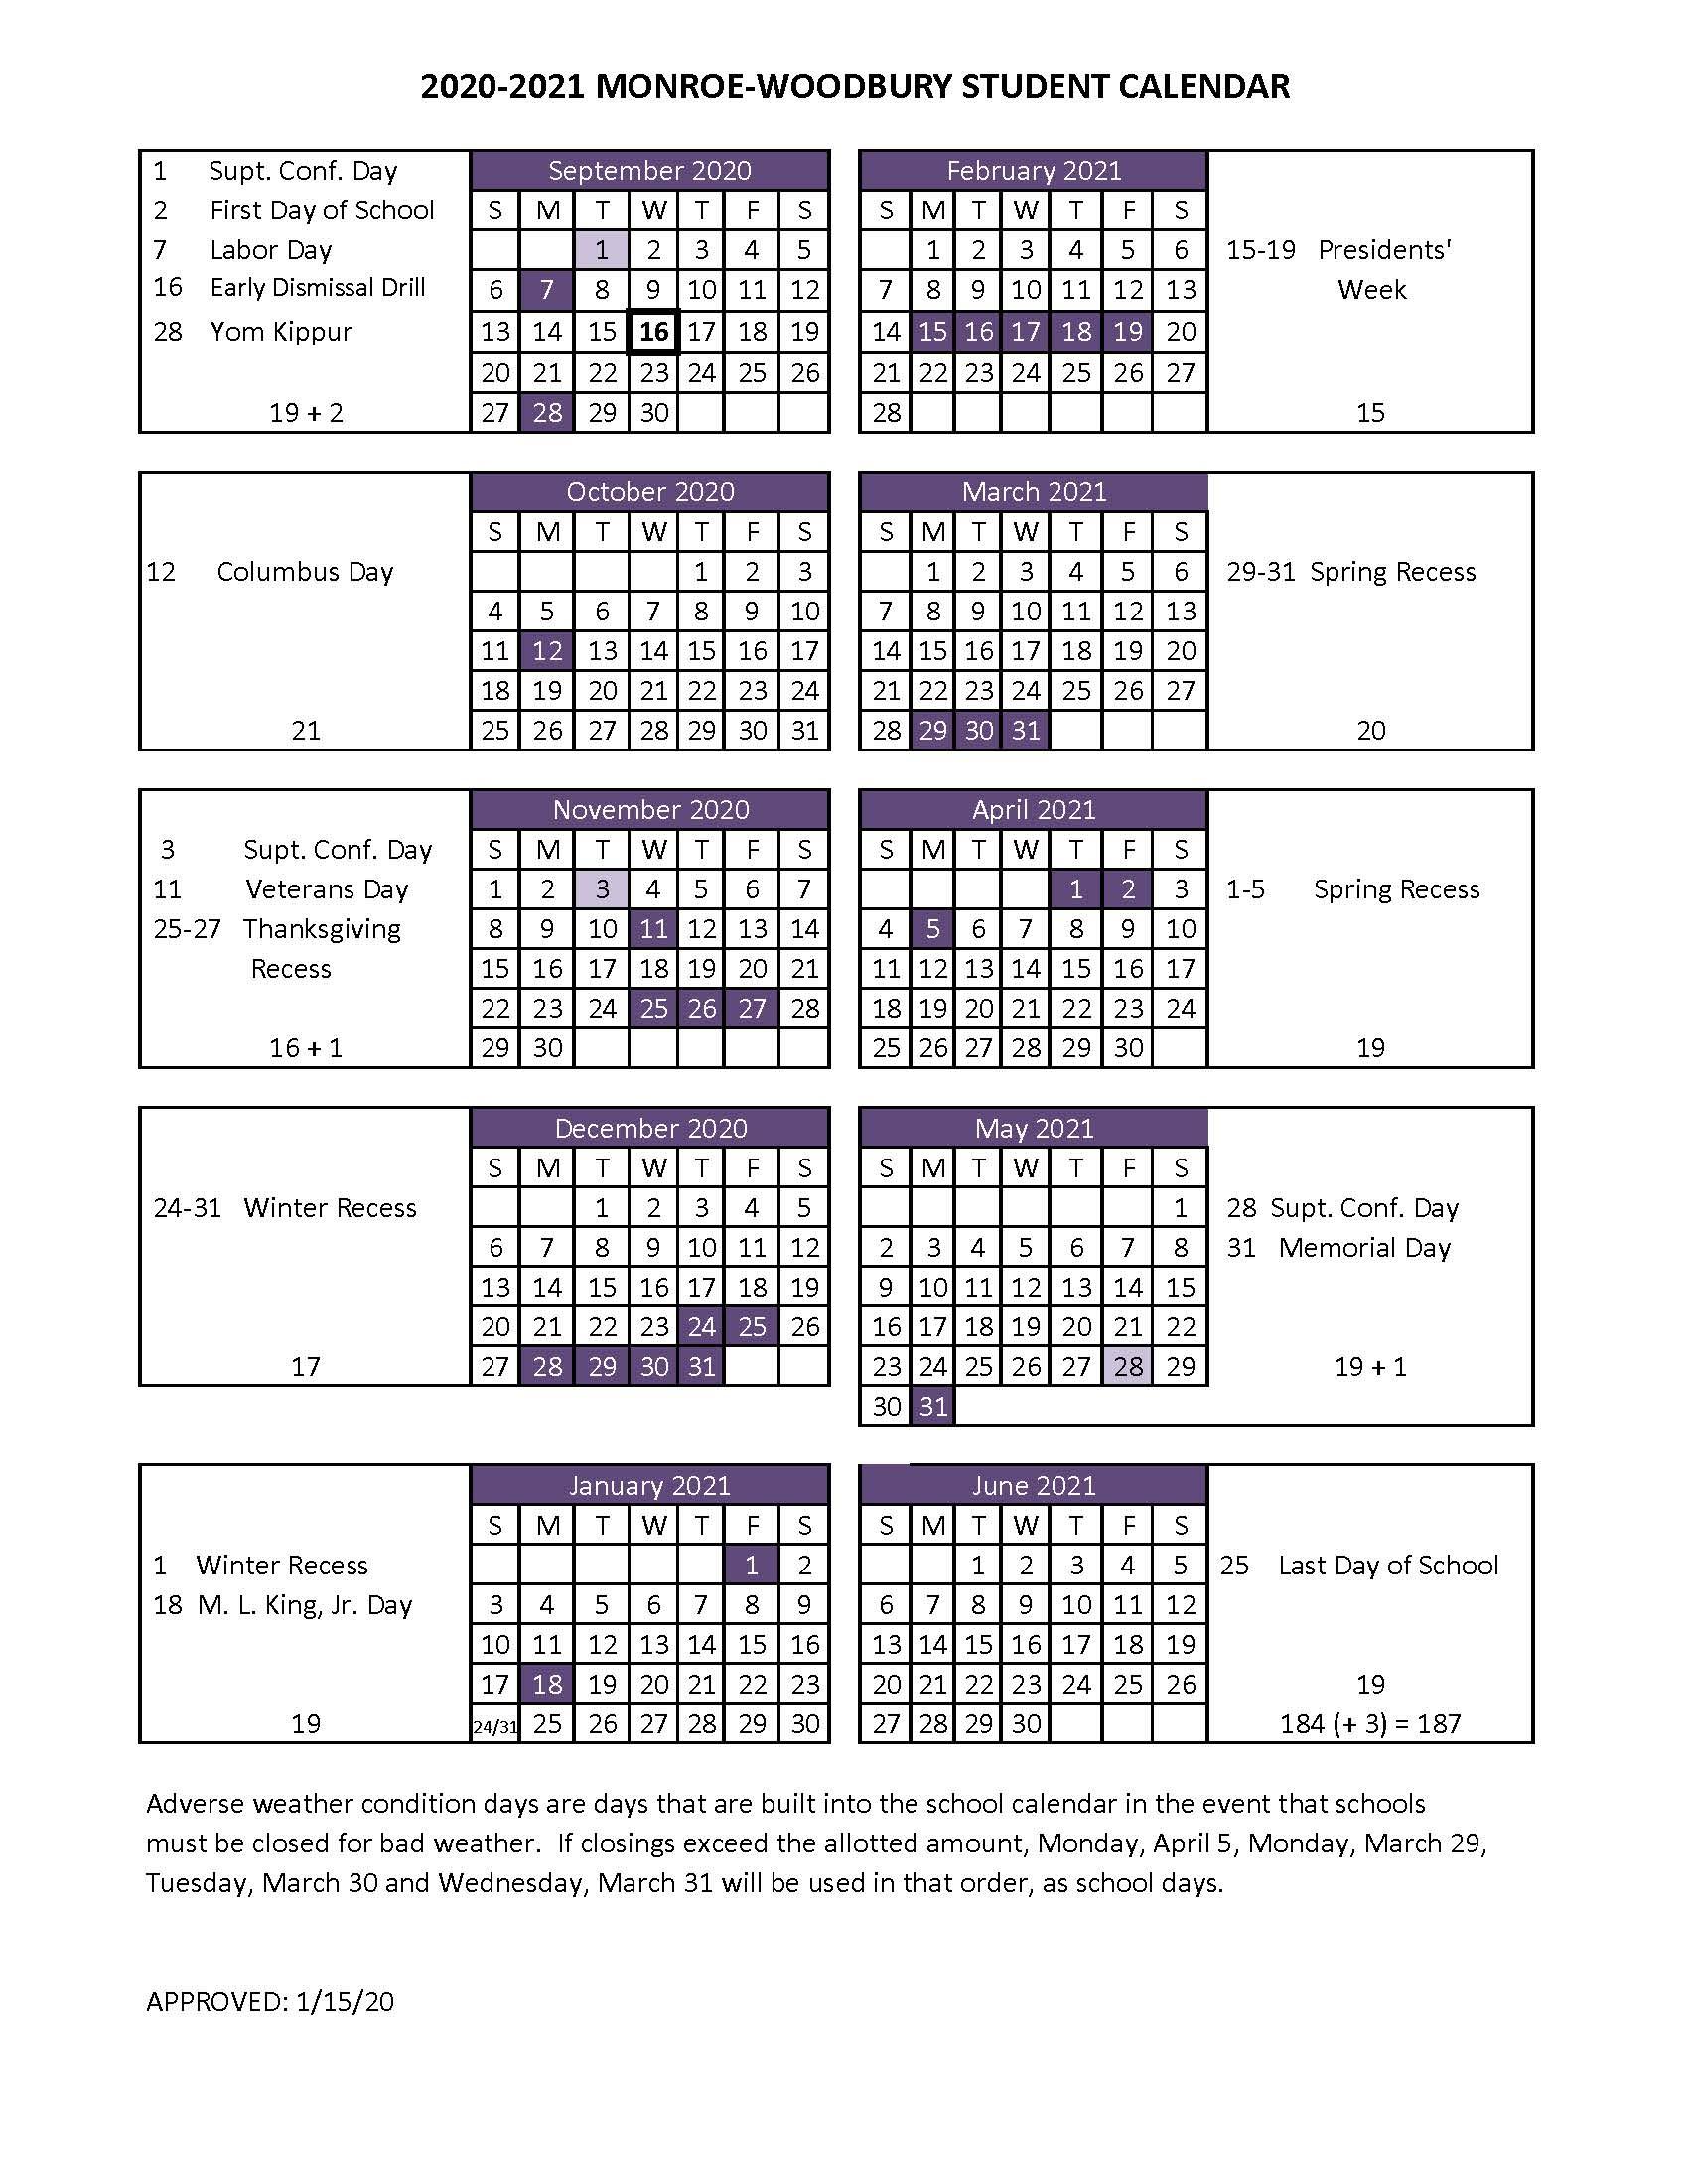 Boe Adopts 2020 2021 Student Calendar - Monroe Woodbury With Regard To Academic Calendar Chamberlain 2021